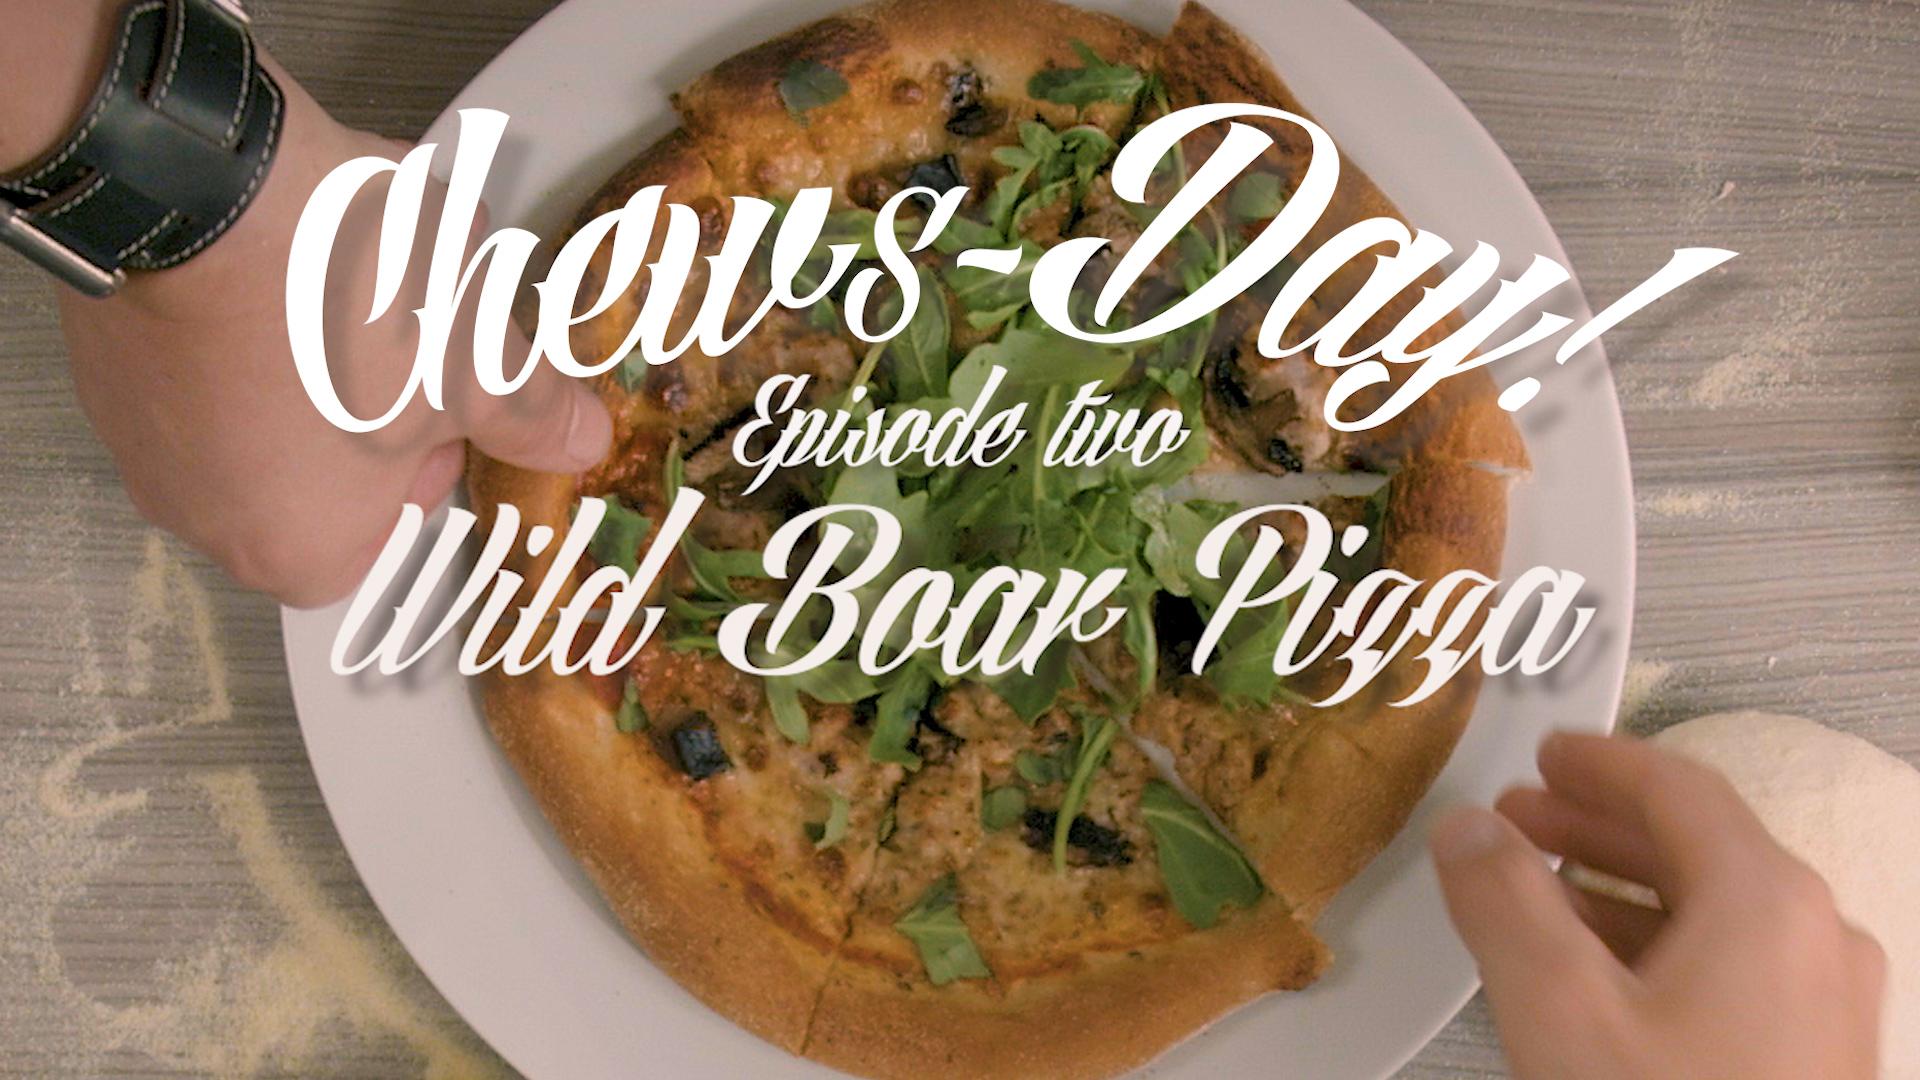 Vlog 02 Wildboar pizza thumb